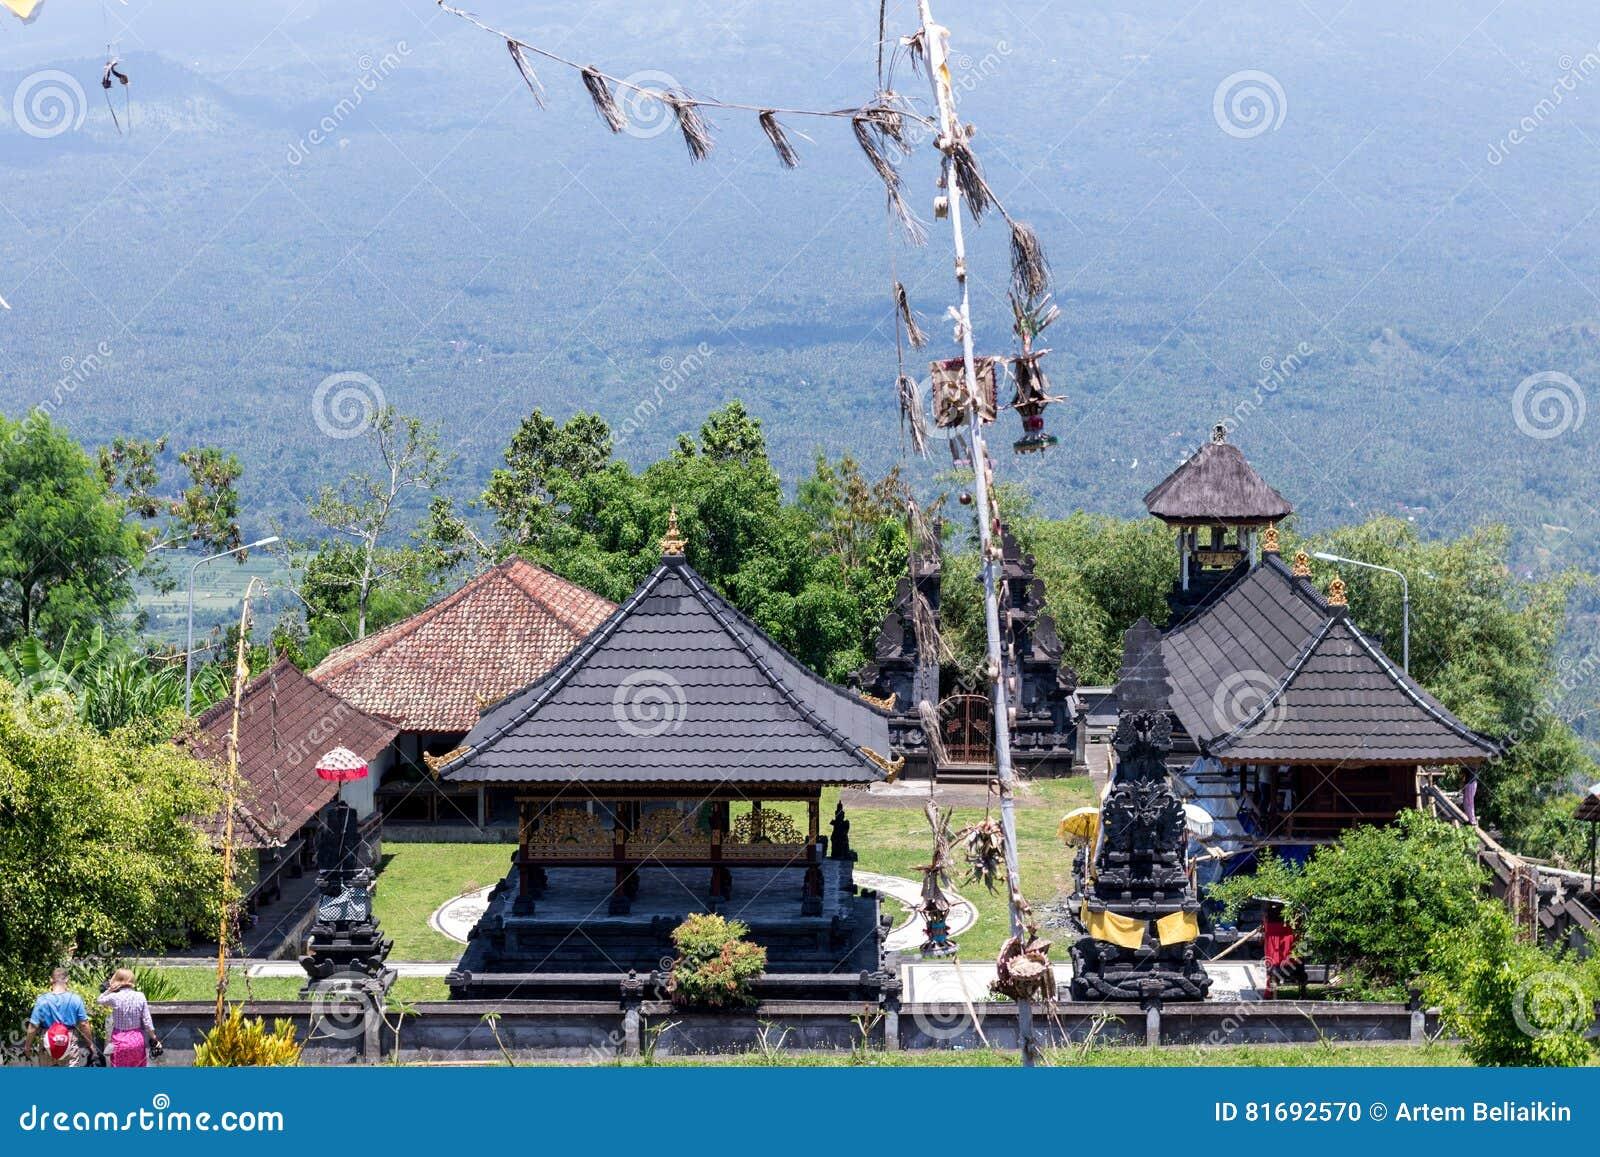 Indonesia Bali Sidemen Landscape With Agung Volcano In Background ...